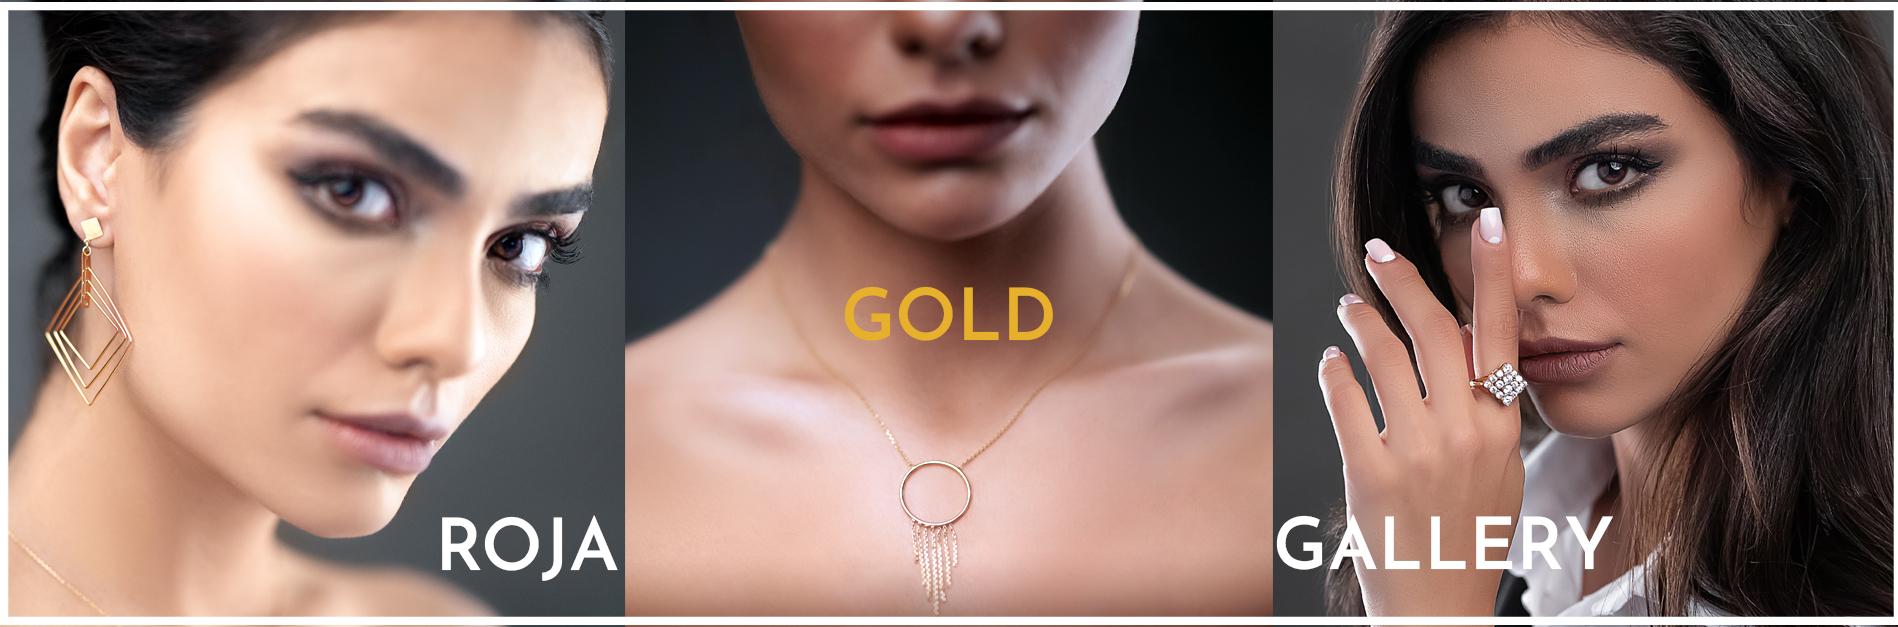 Roja Gold Gallery - گالری طلای روژا